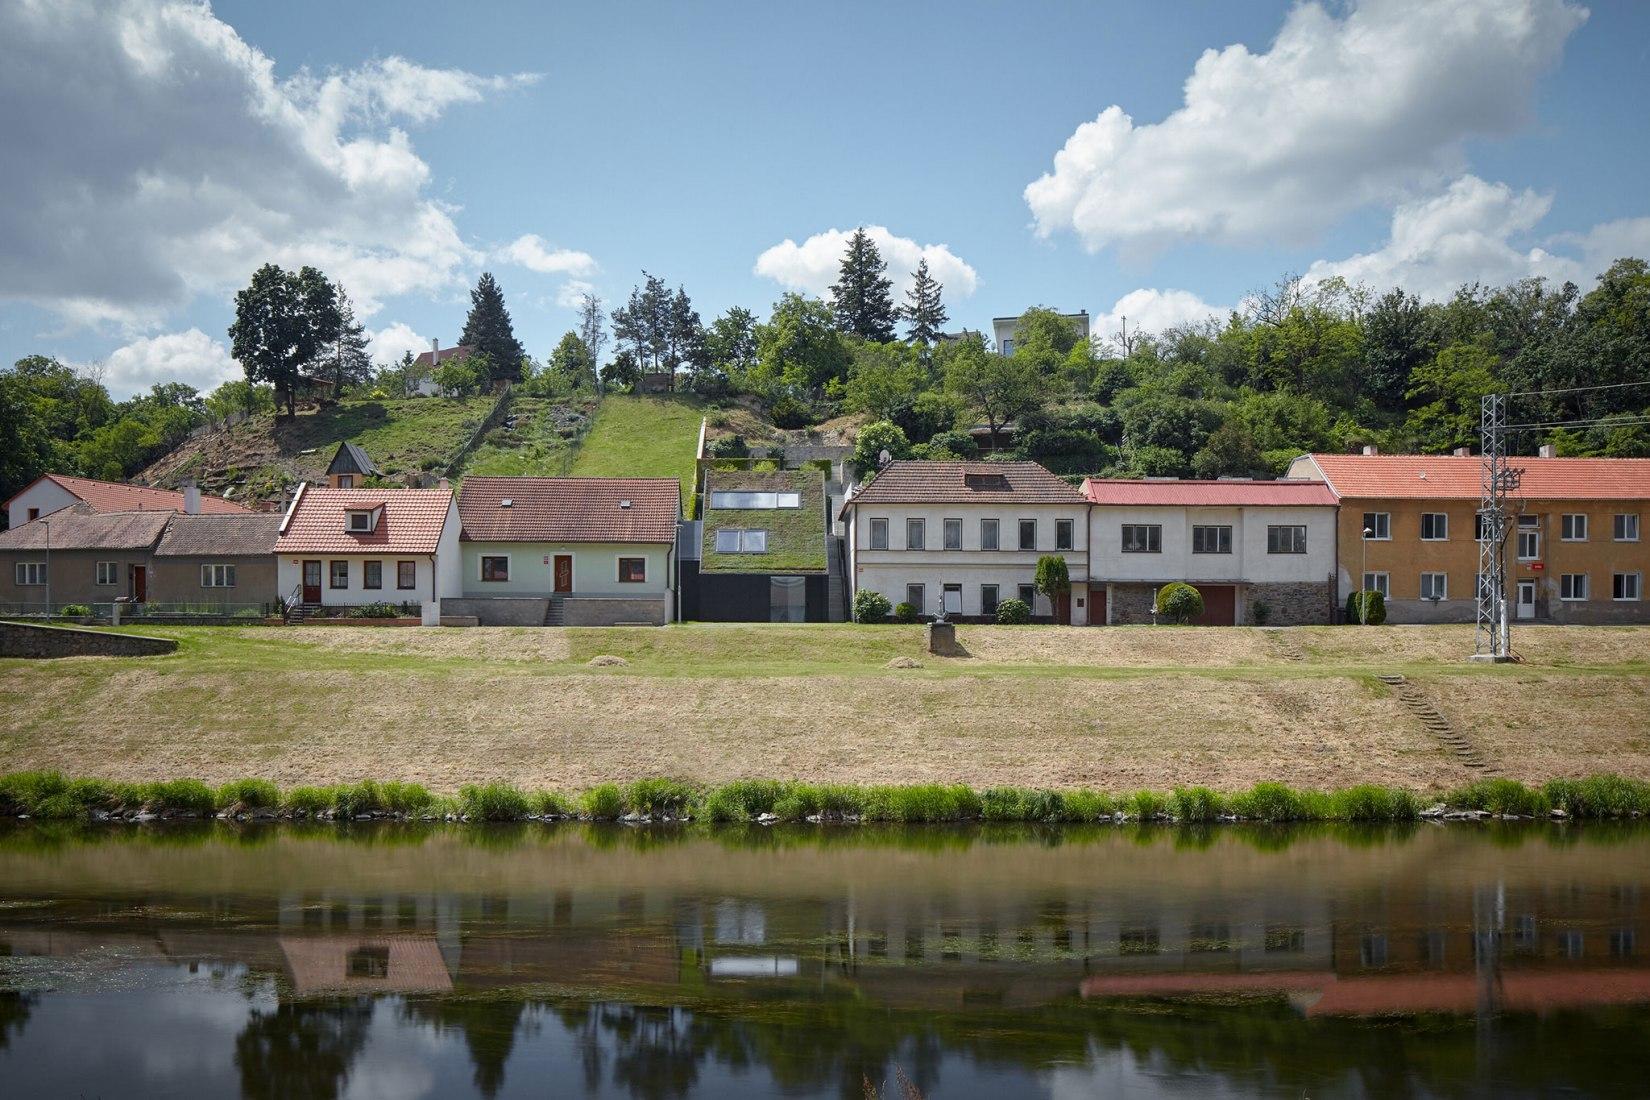 Family House in the River Valley by Kuba & Pilar architekti. Photograph by BoysPlayNice